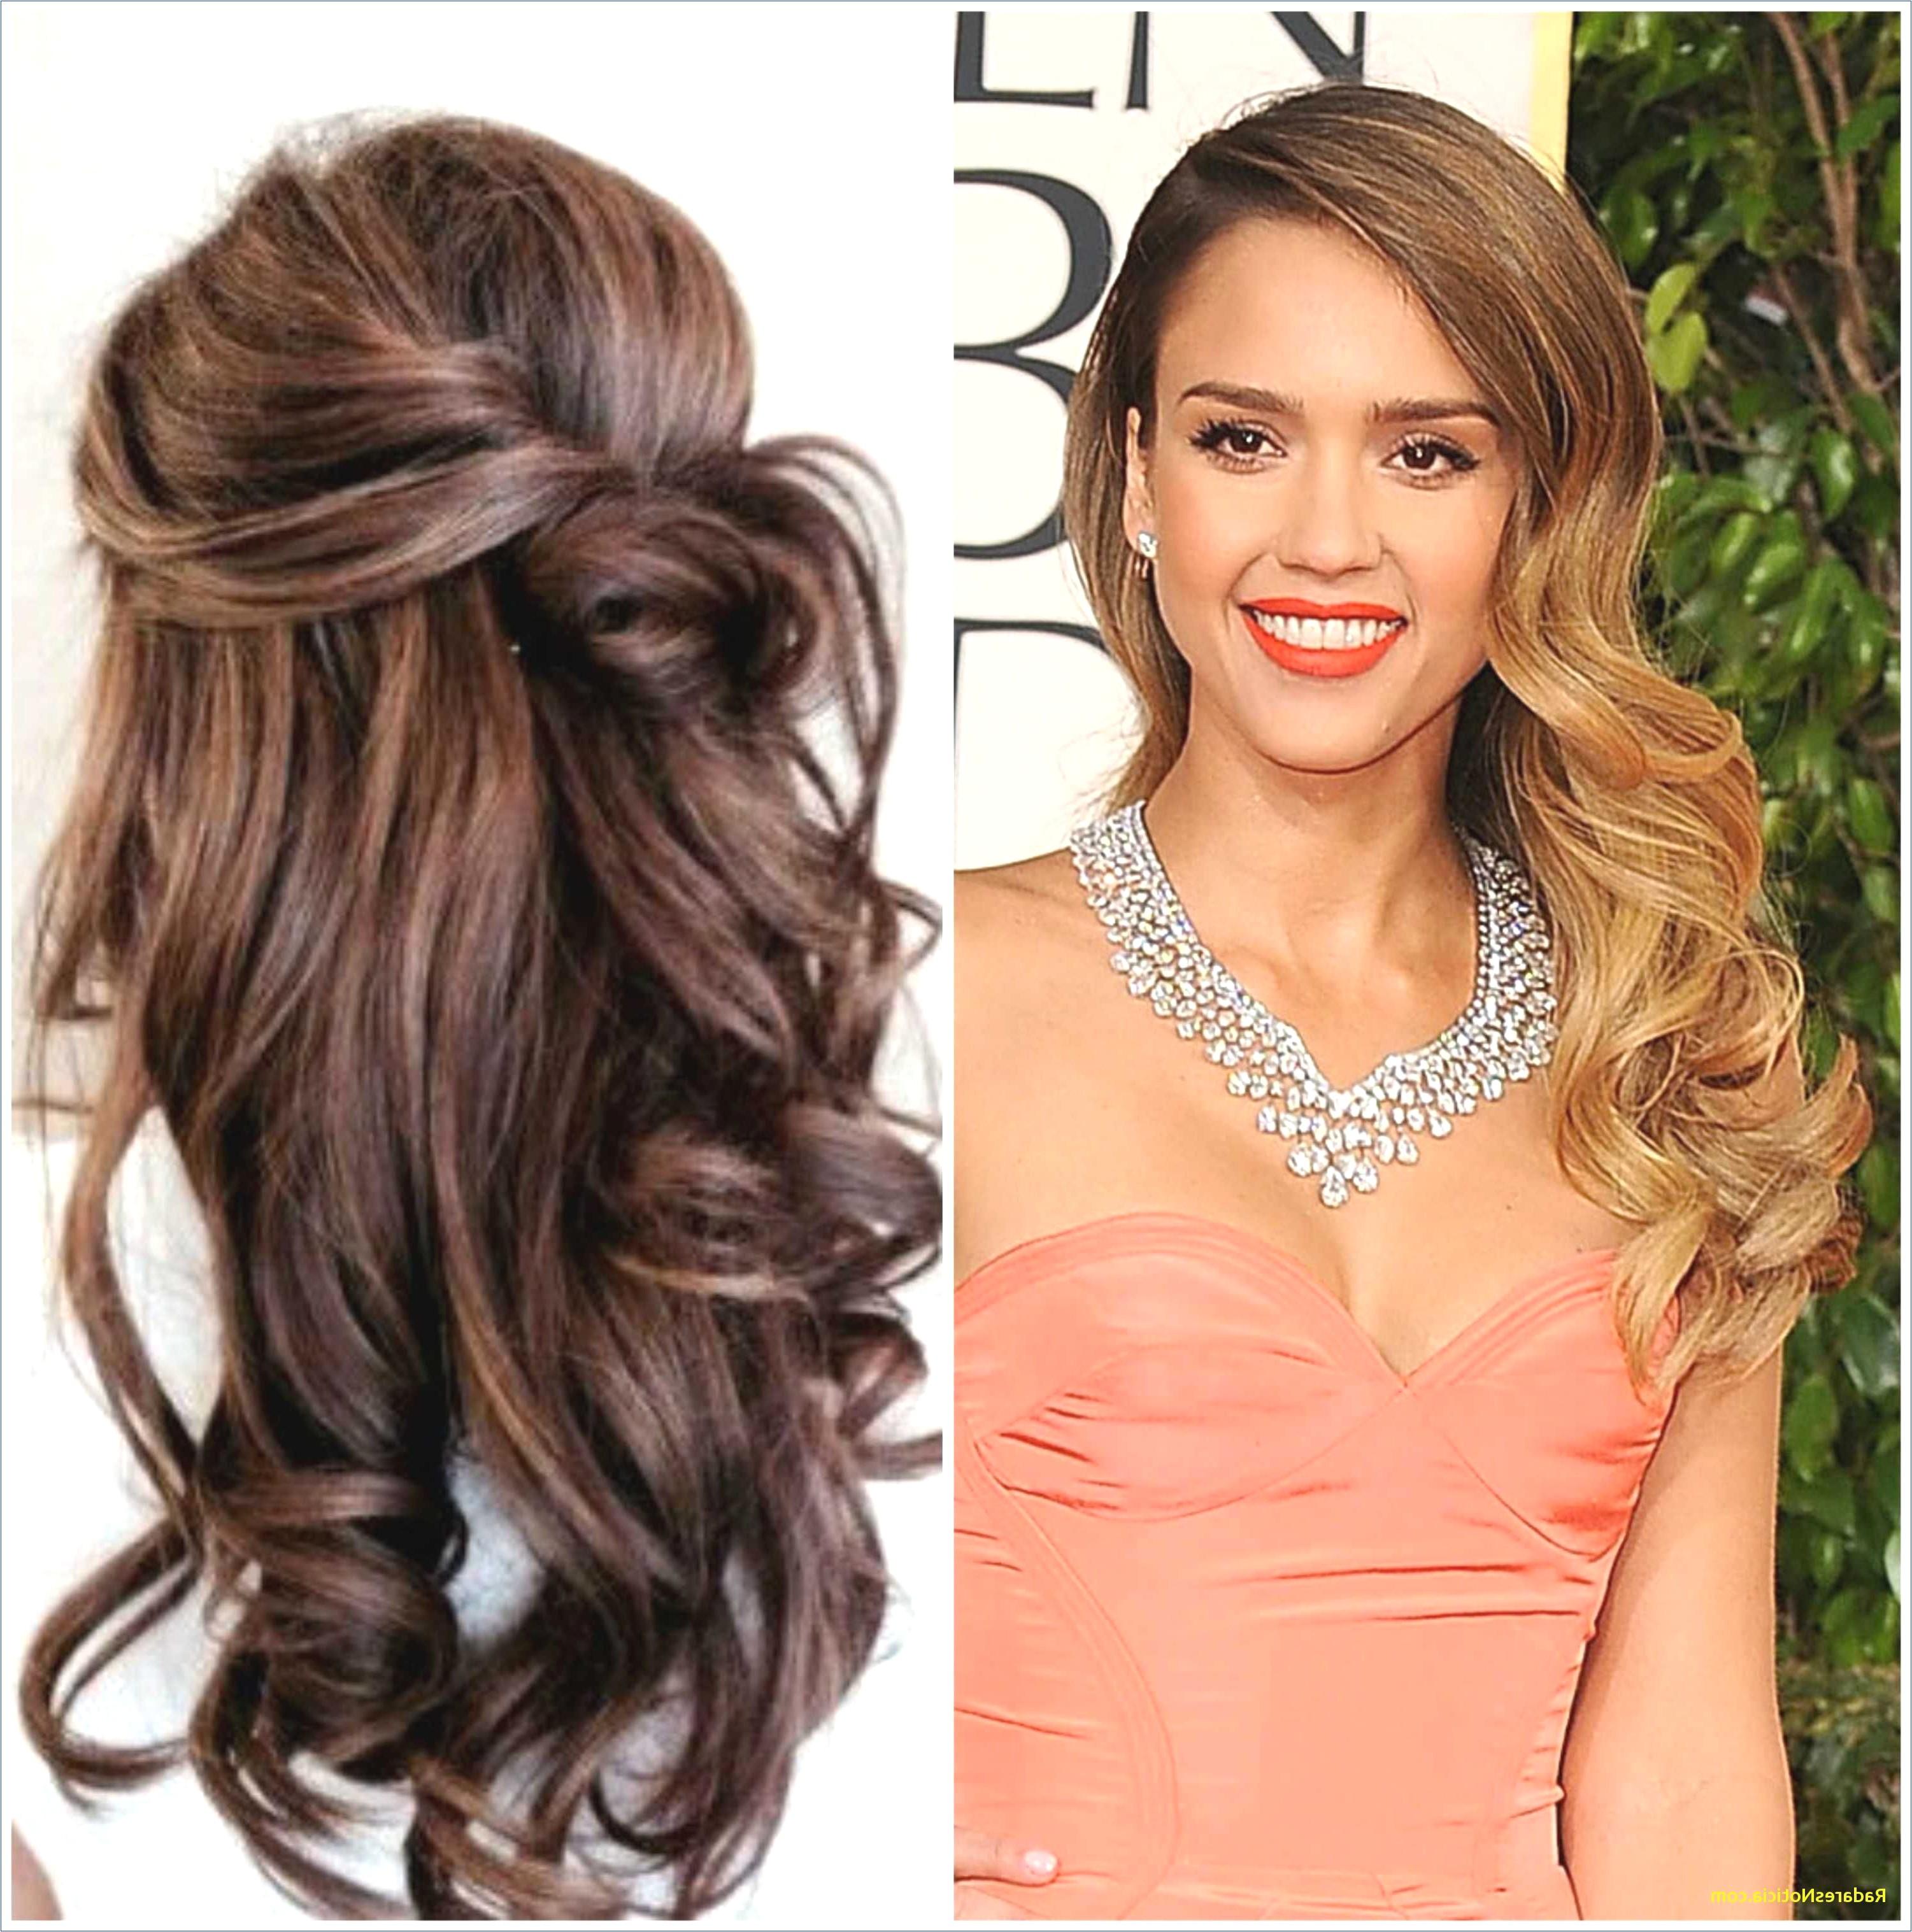 braided curly mohawk hairstyles luxury 9 list curled braided hairstyles of braided curly mohawk hairstyles